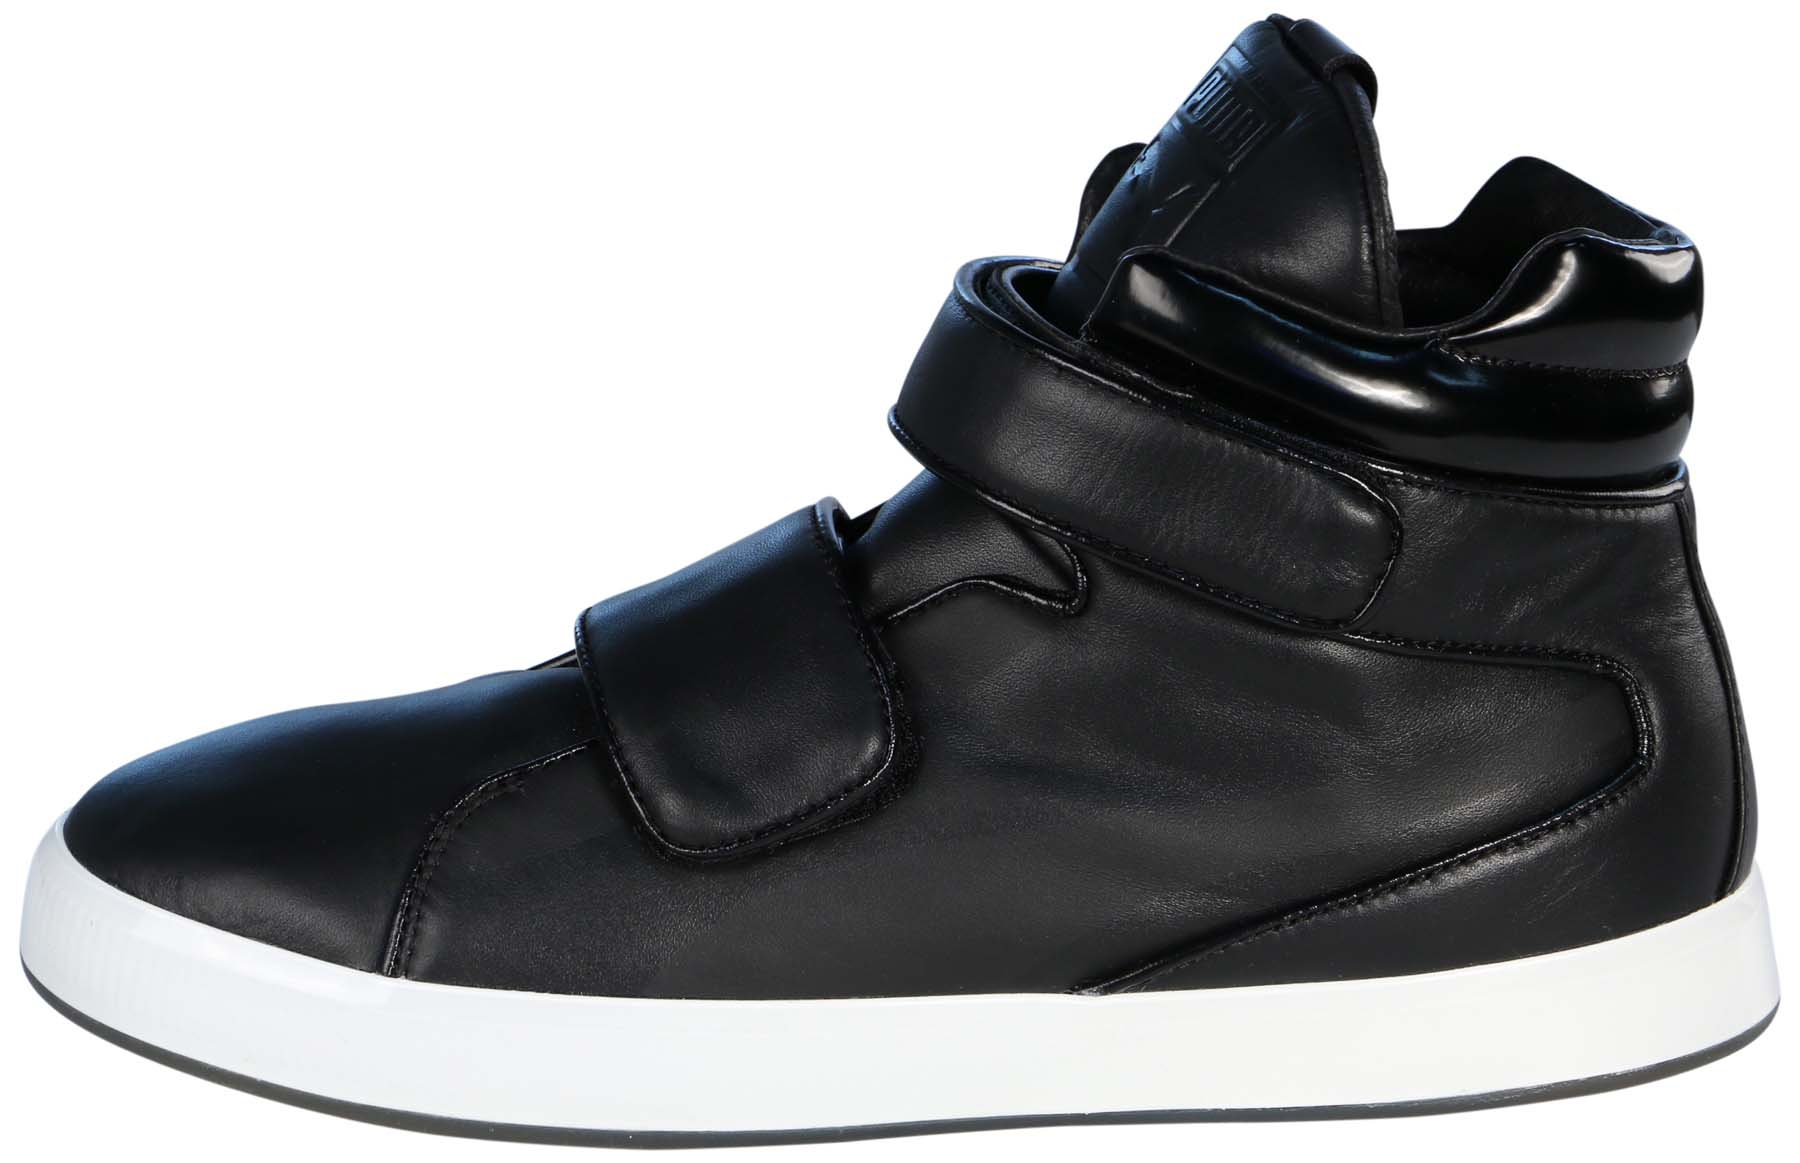 Apex Basketball Shoes